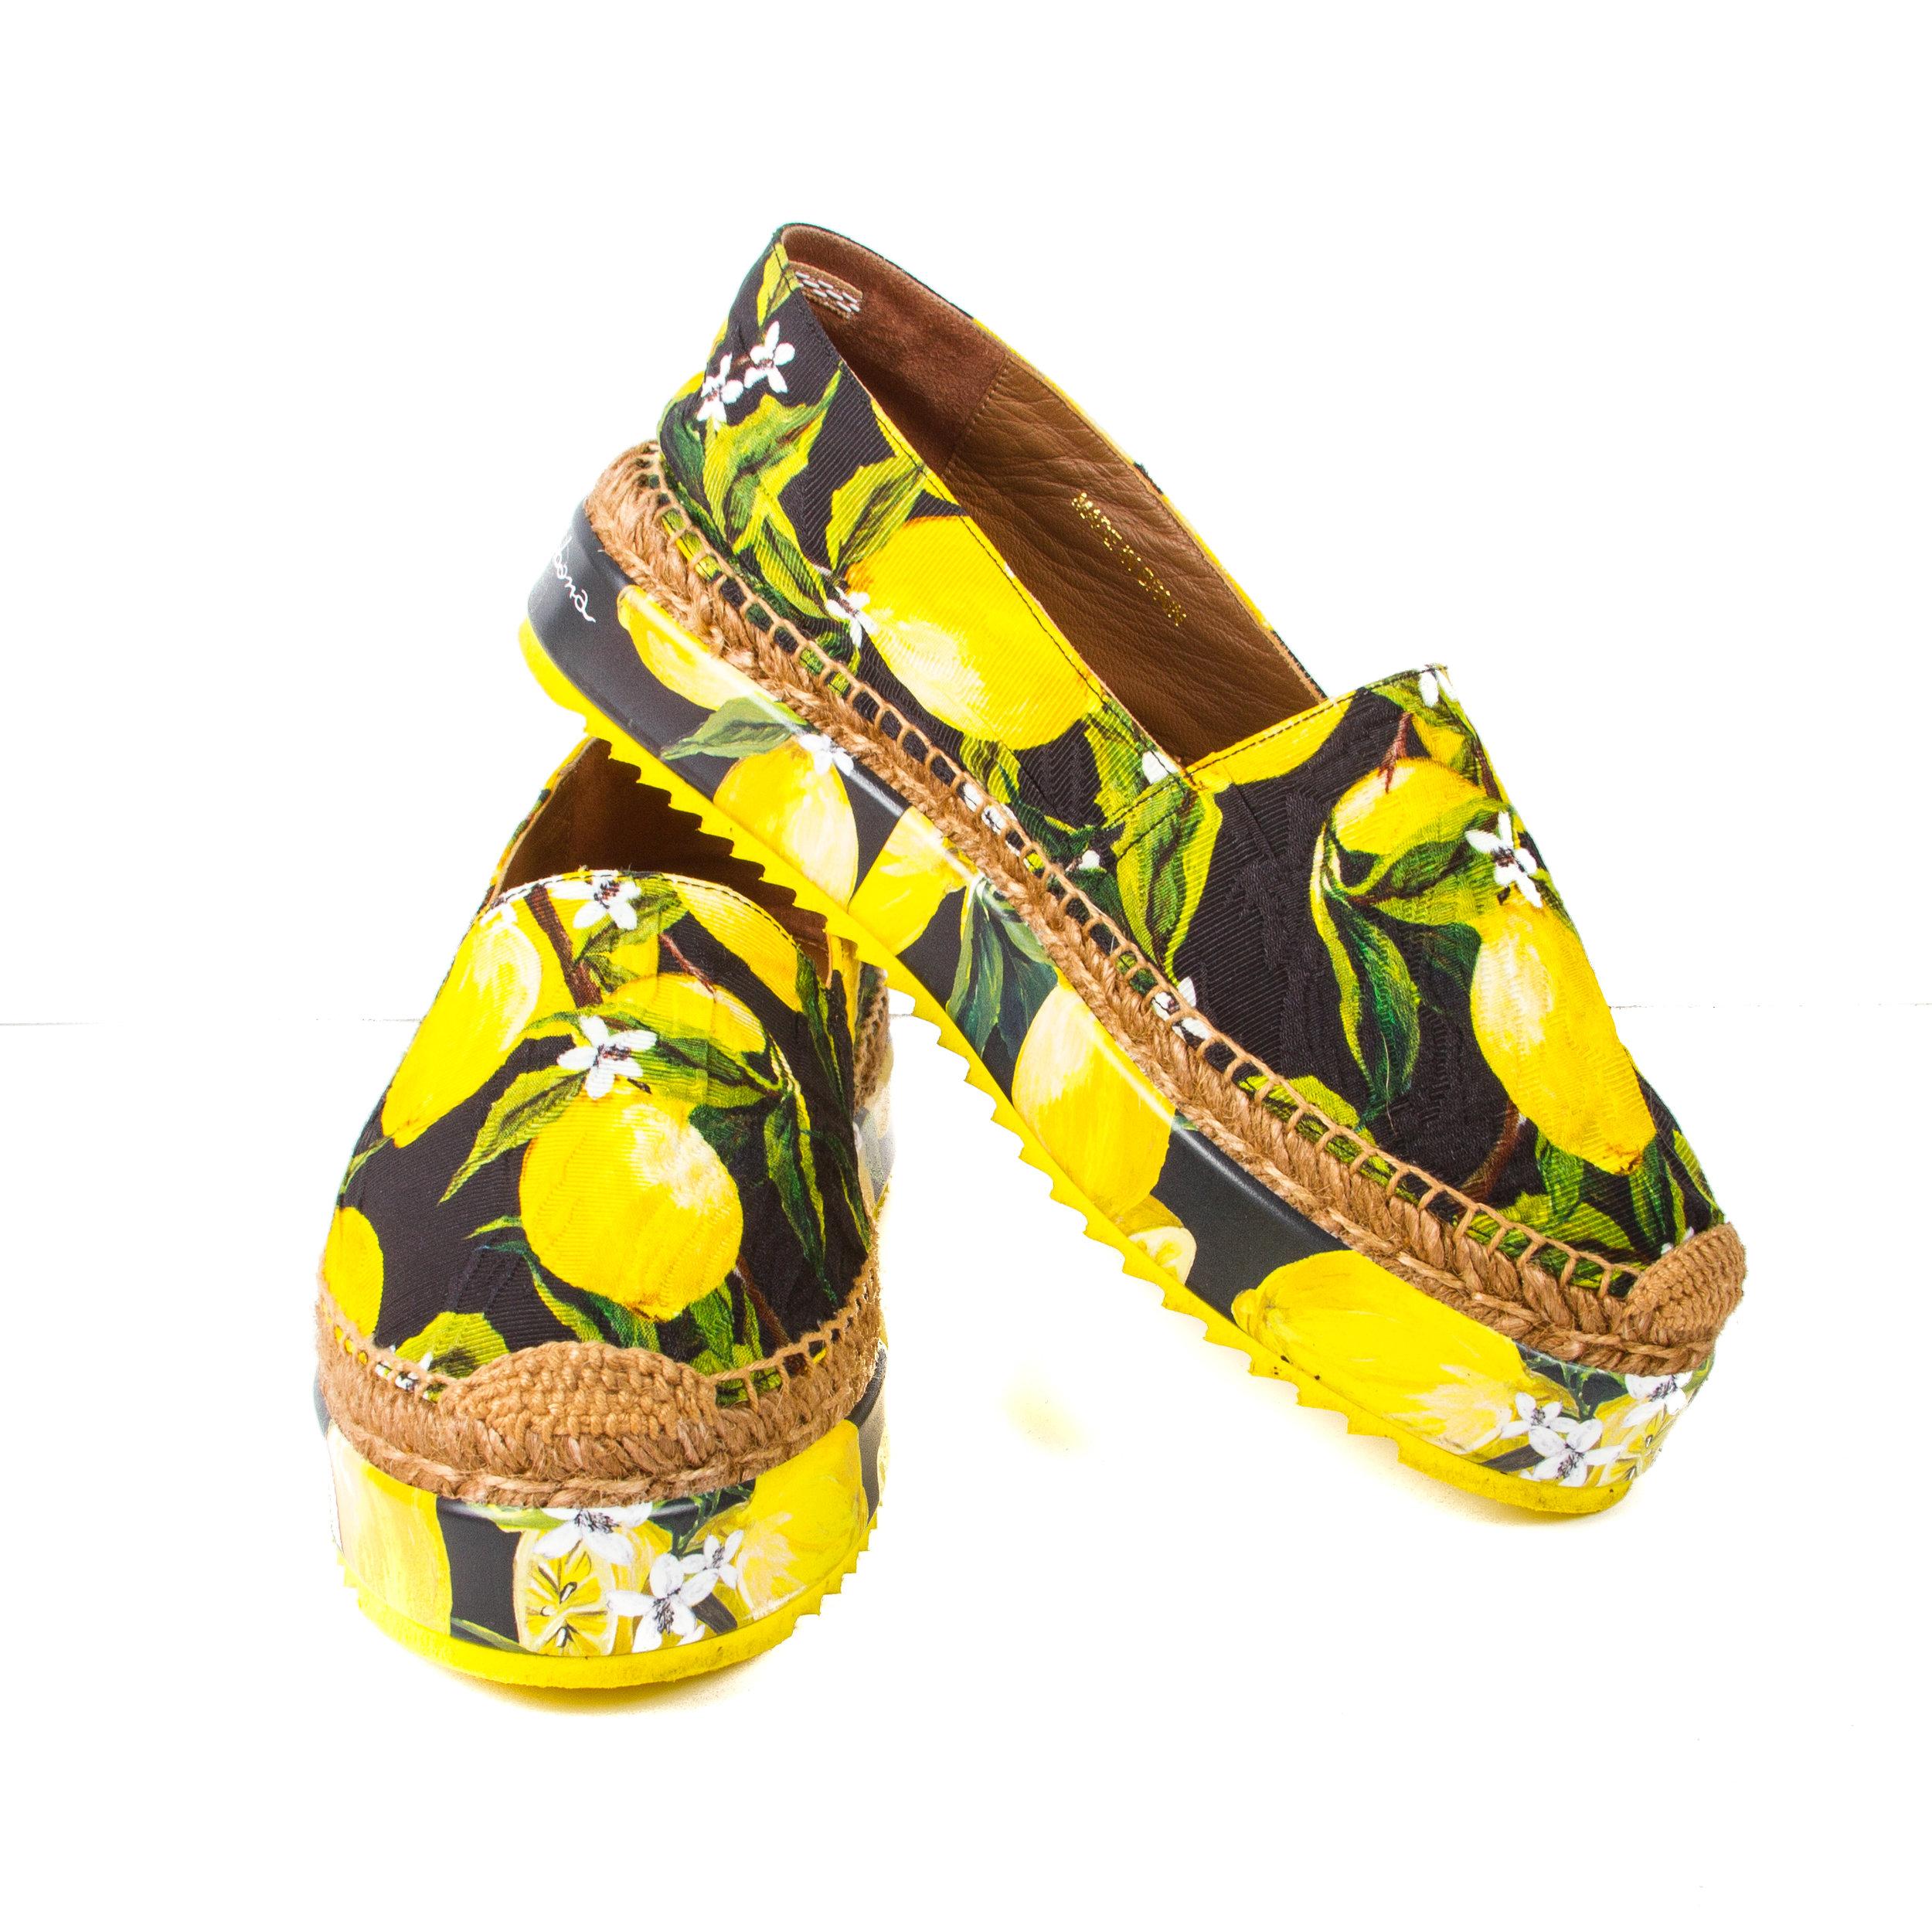 Dolce&GabbanaShoesjpg.jpg